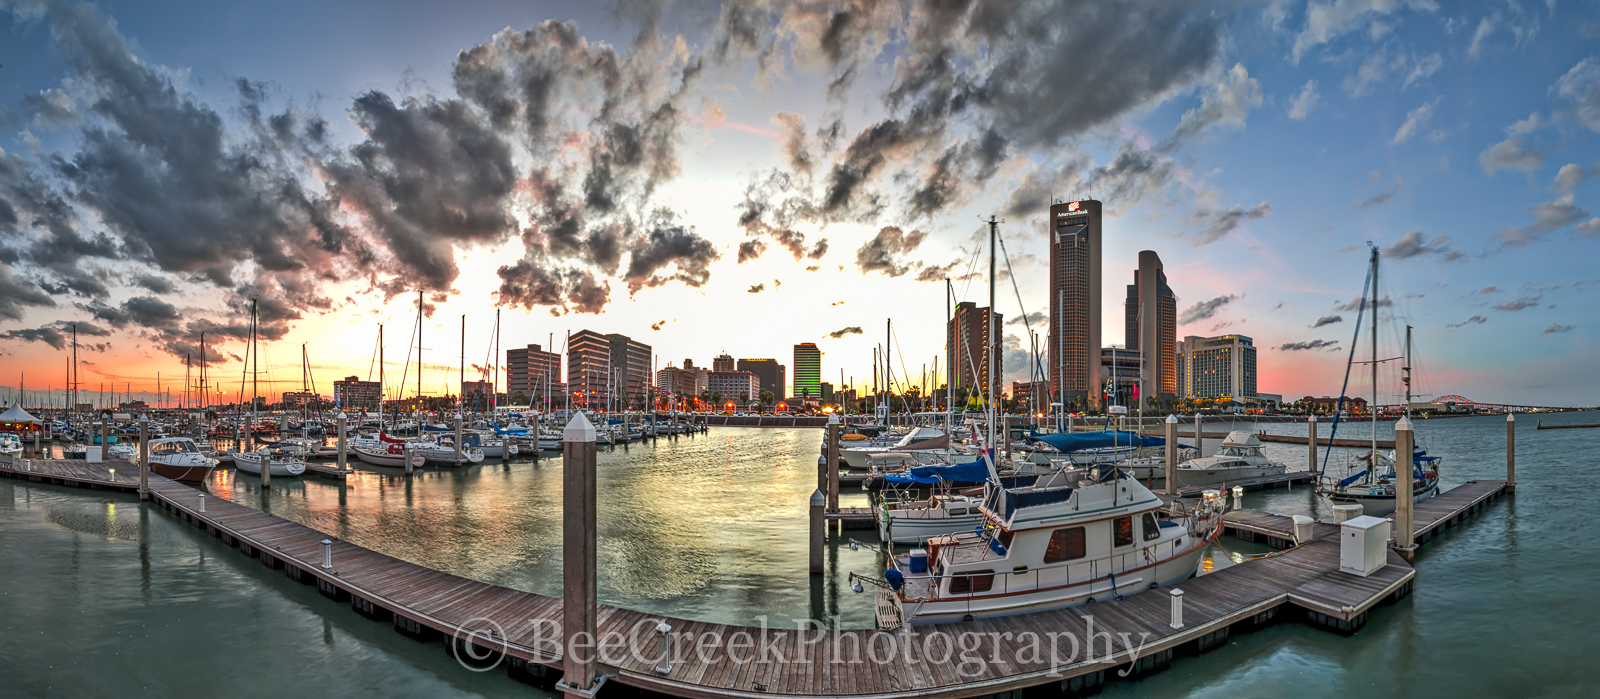 Corpus Christi, Texas Coast, bay, beach, boats, city, cityscape, clouds, coastal, colorful skies, dock, dusk, gulf of mexico, landscape, marina, nautical, oceanscape, panorama, sailboats, scenic, seas, photo